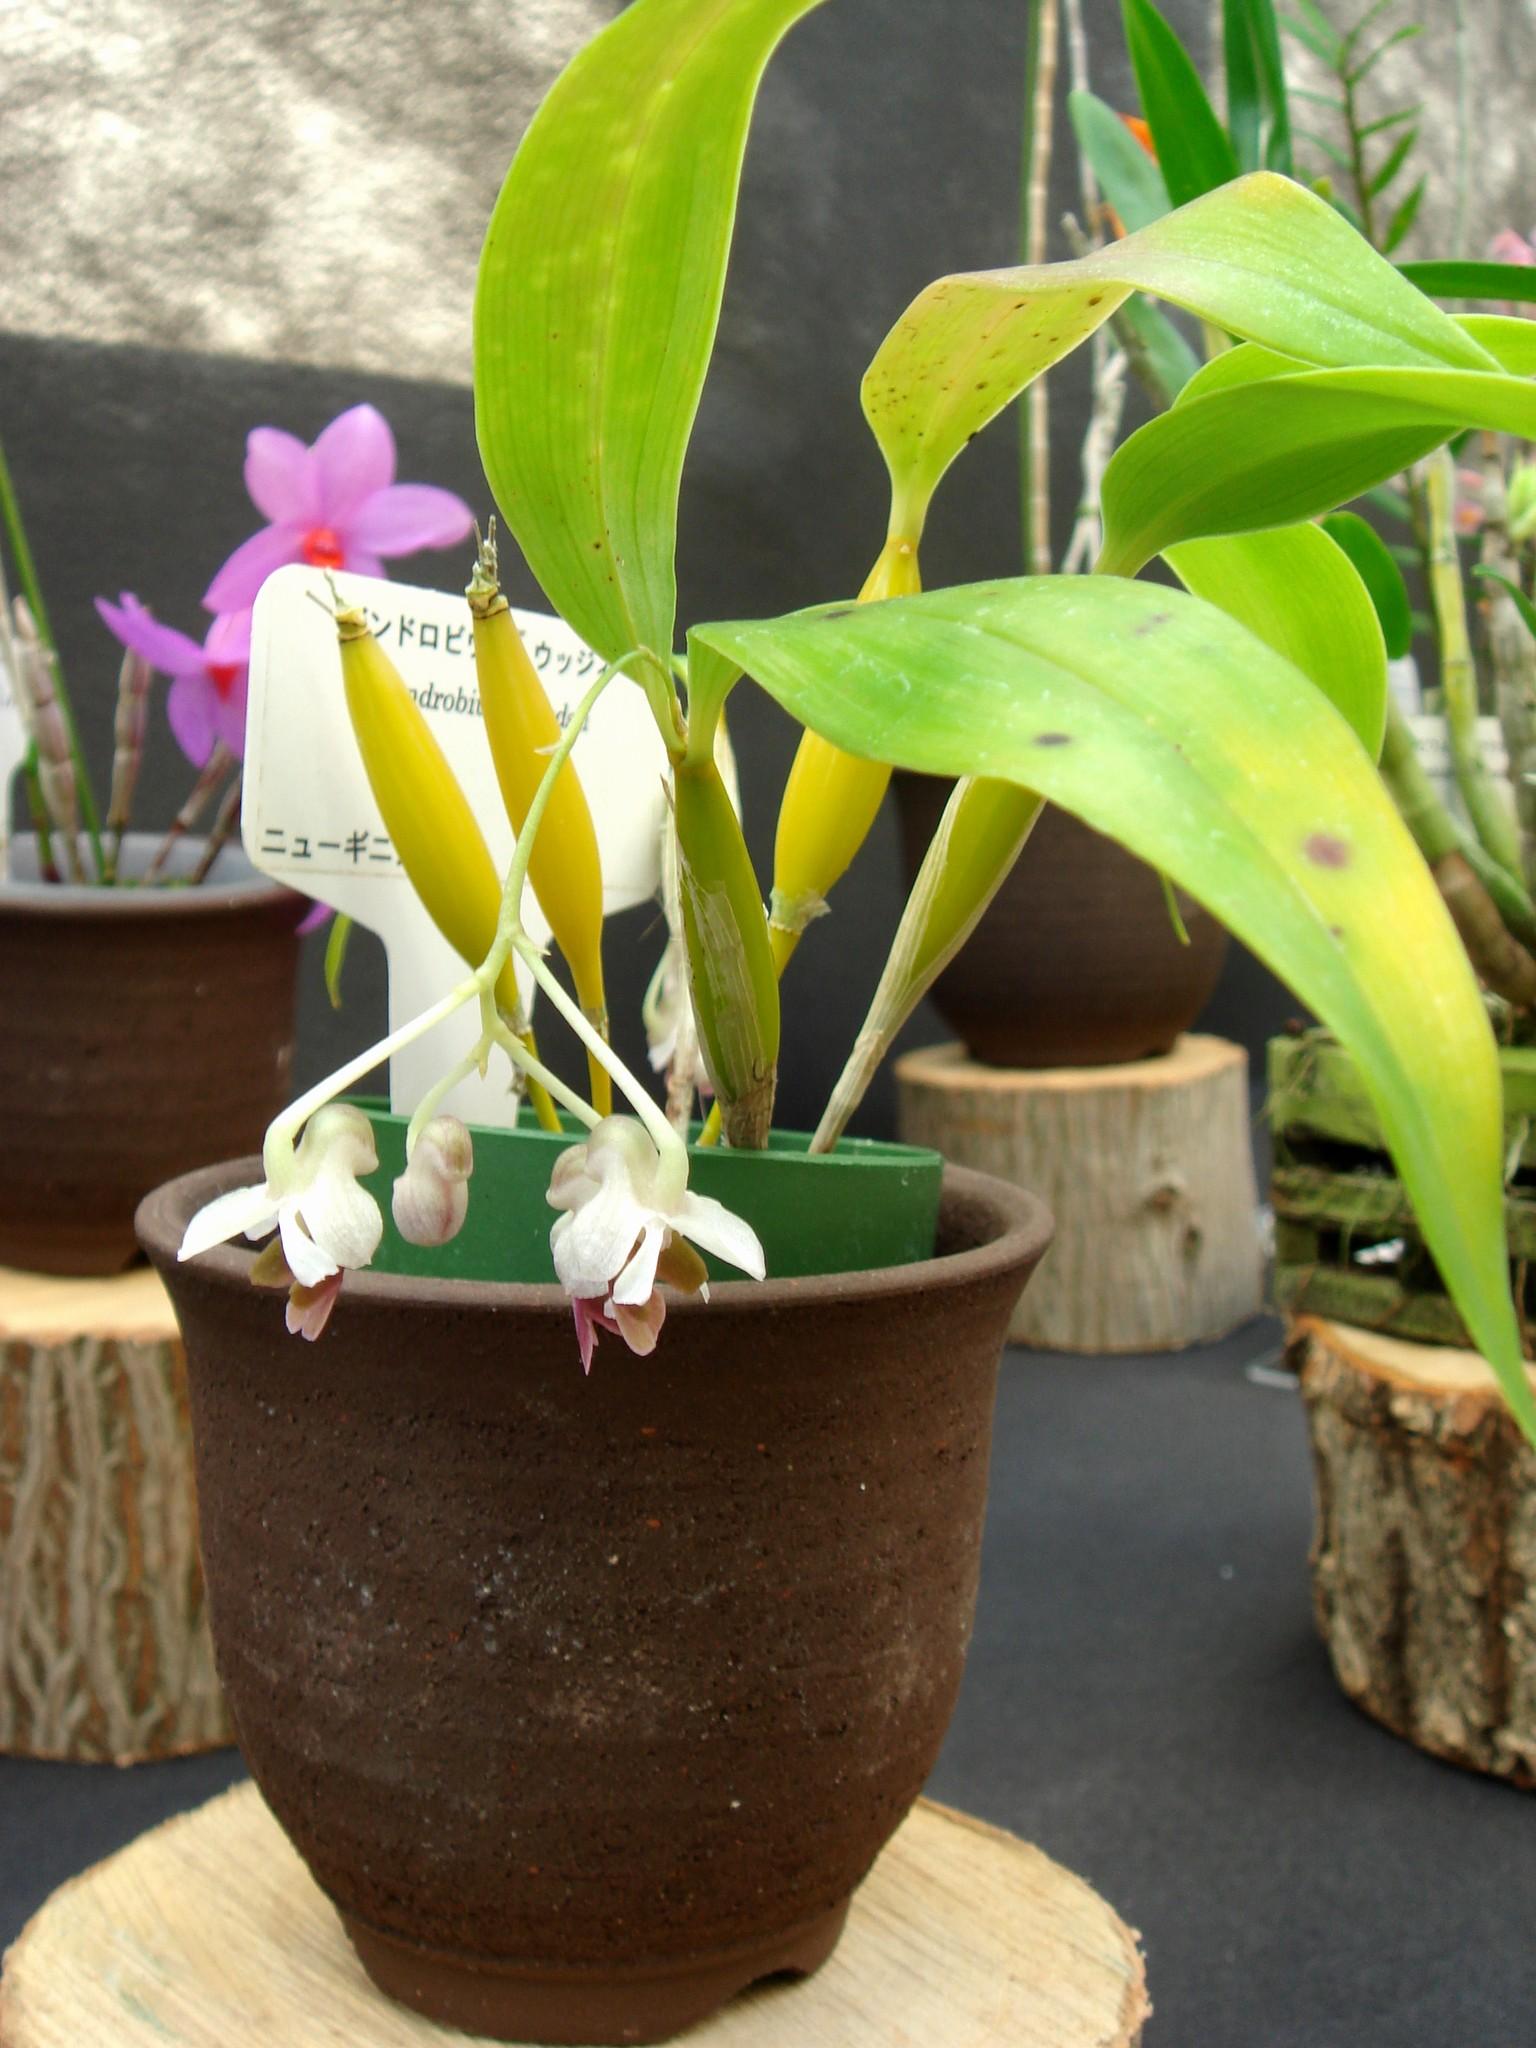 http://orchids.la.coocan.jp/Dendrobium/Dendrobium%20woodsii/DSC08898.JPG